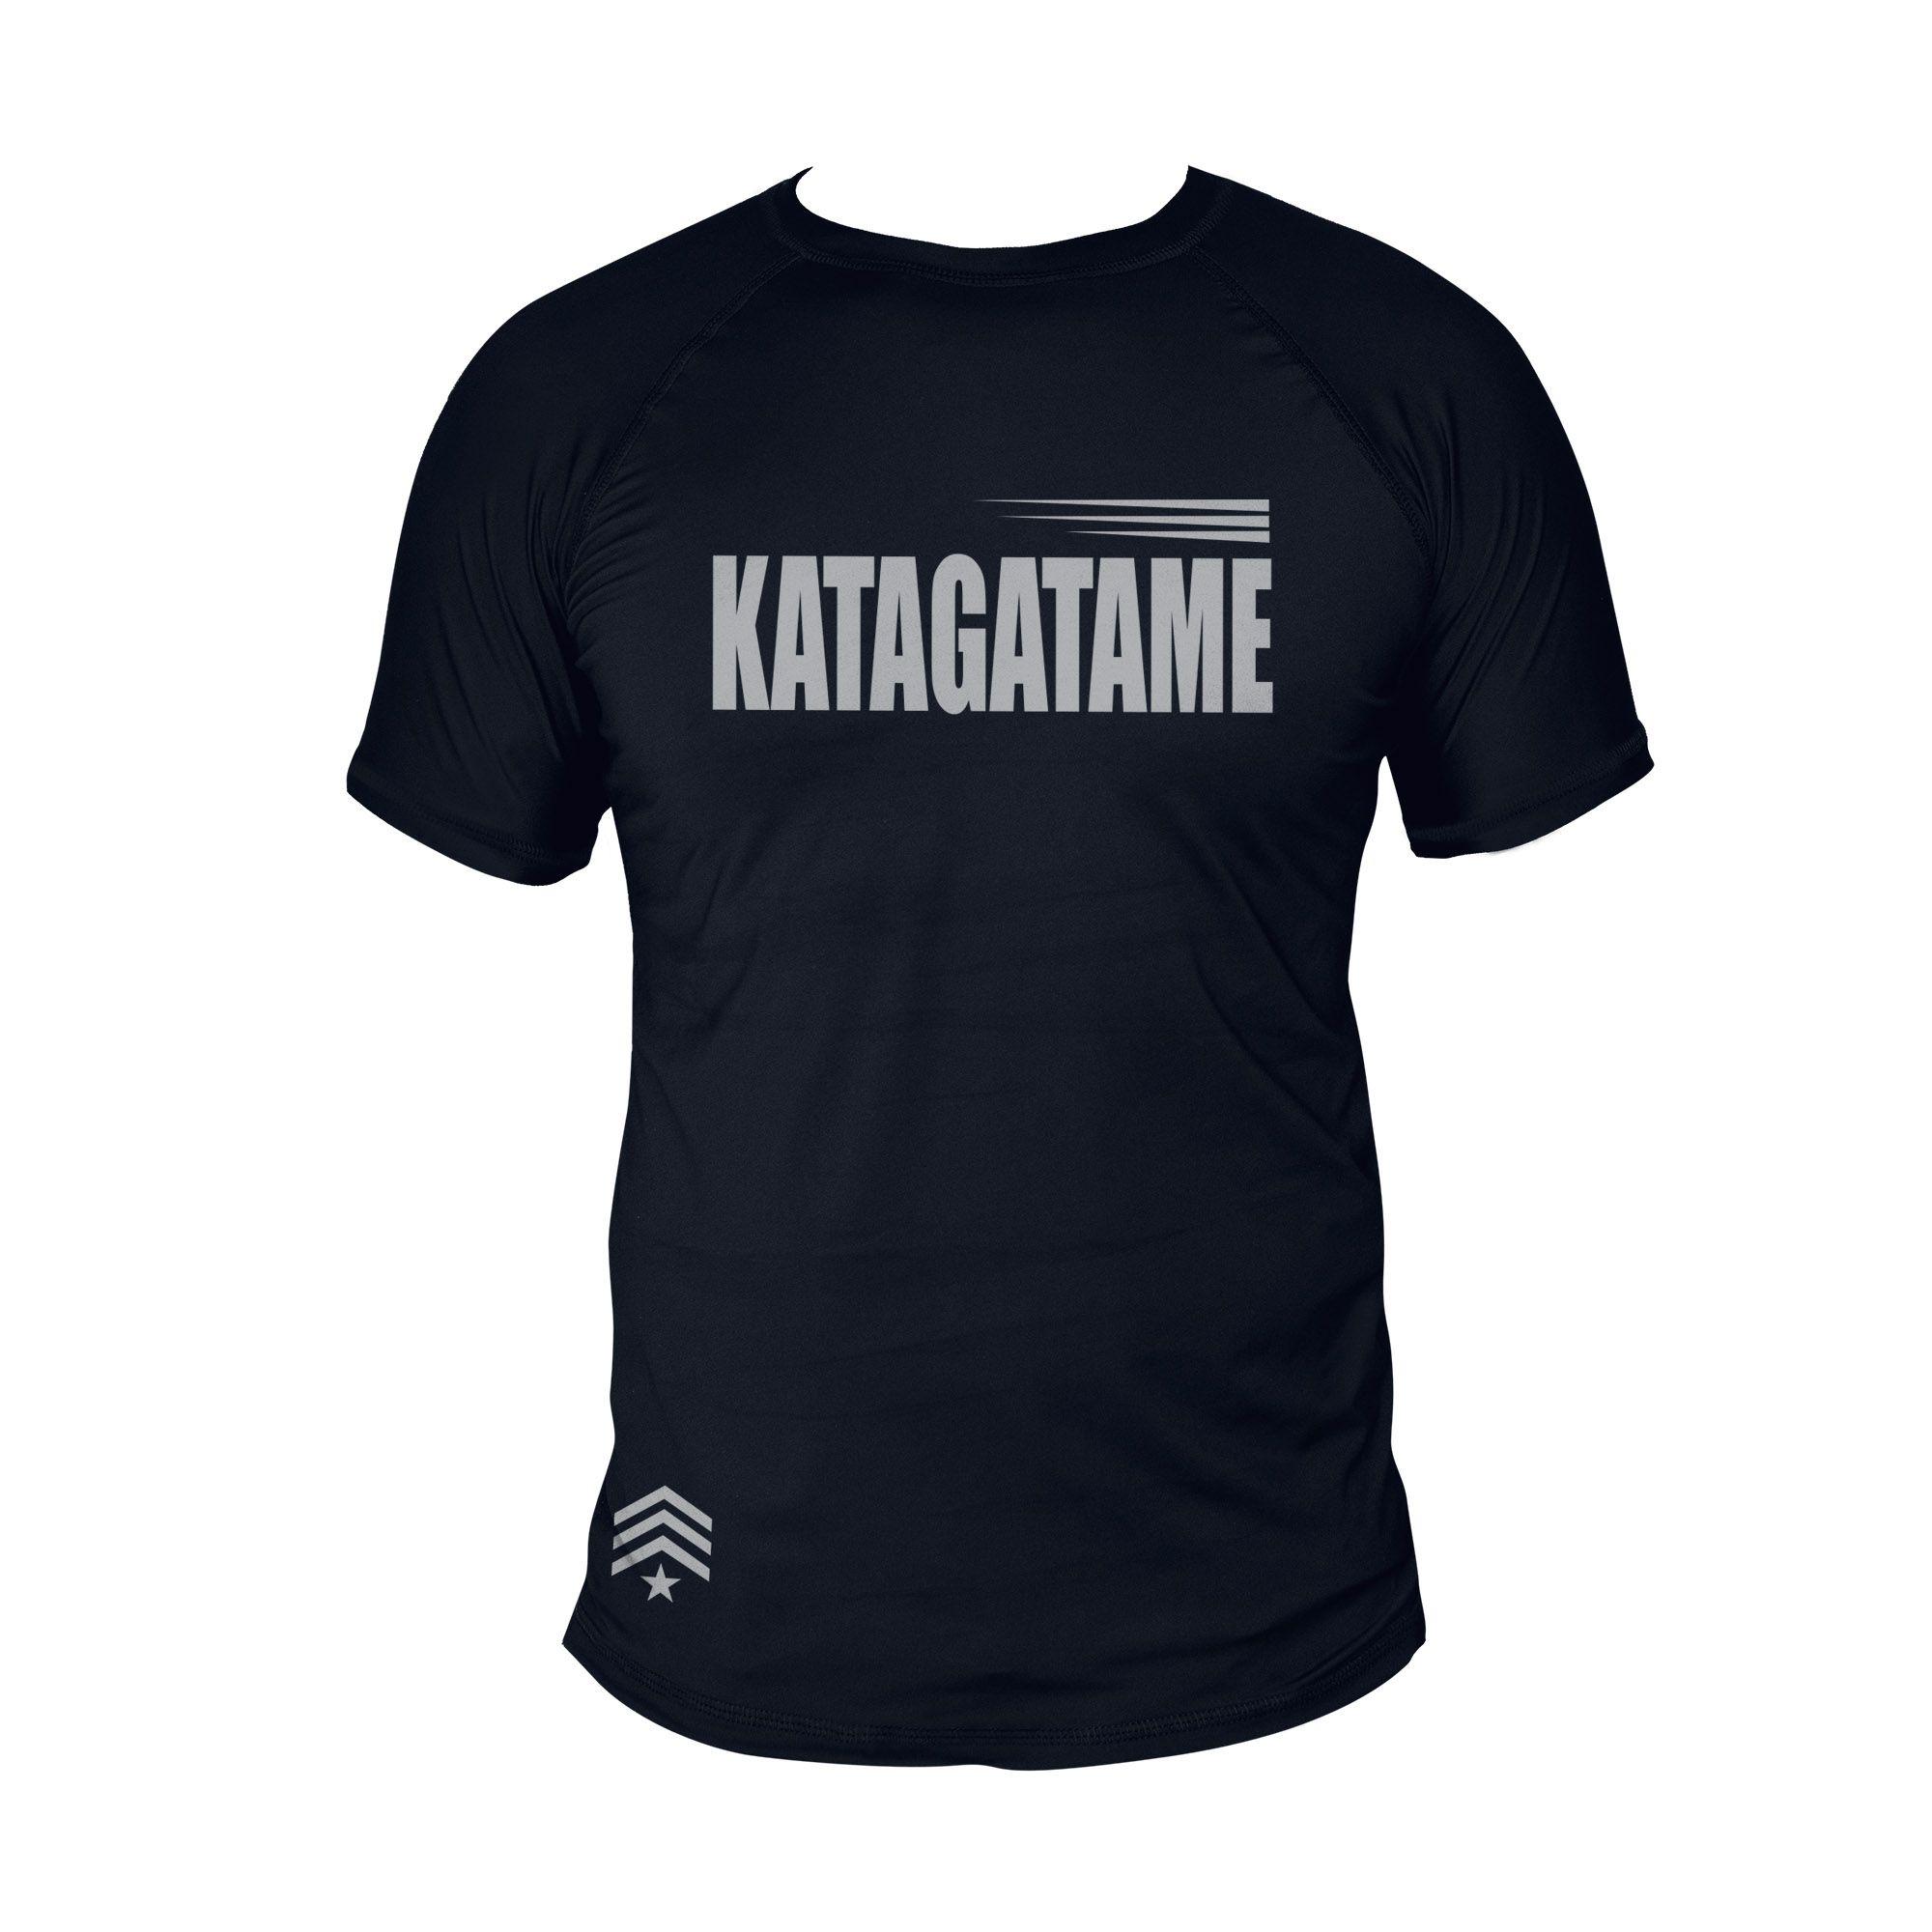 Camiseta Jiu-Jitsu Katagatame Uppercut  Dry U.V